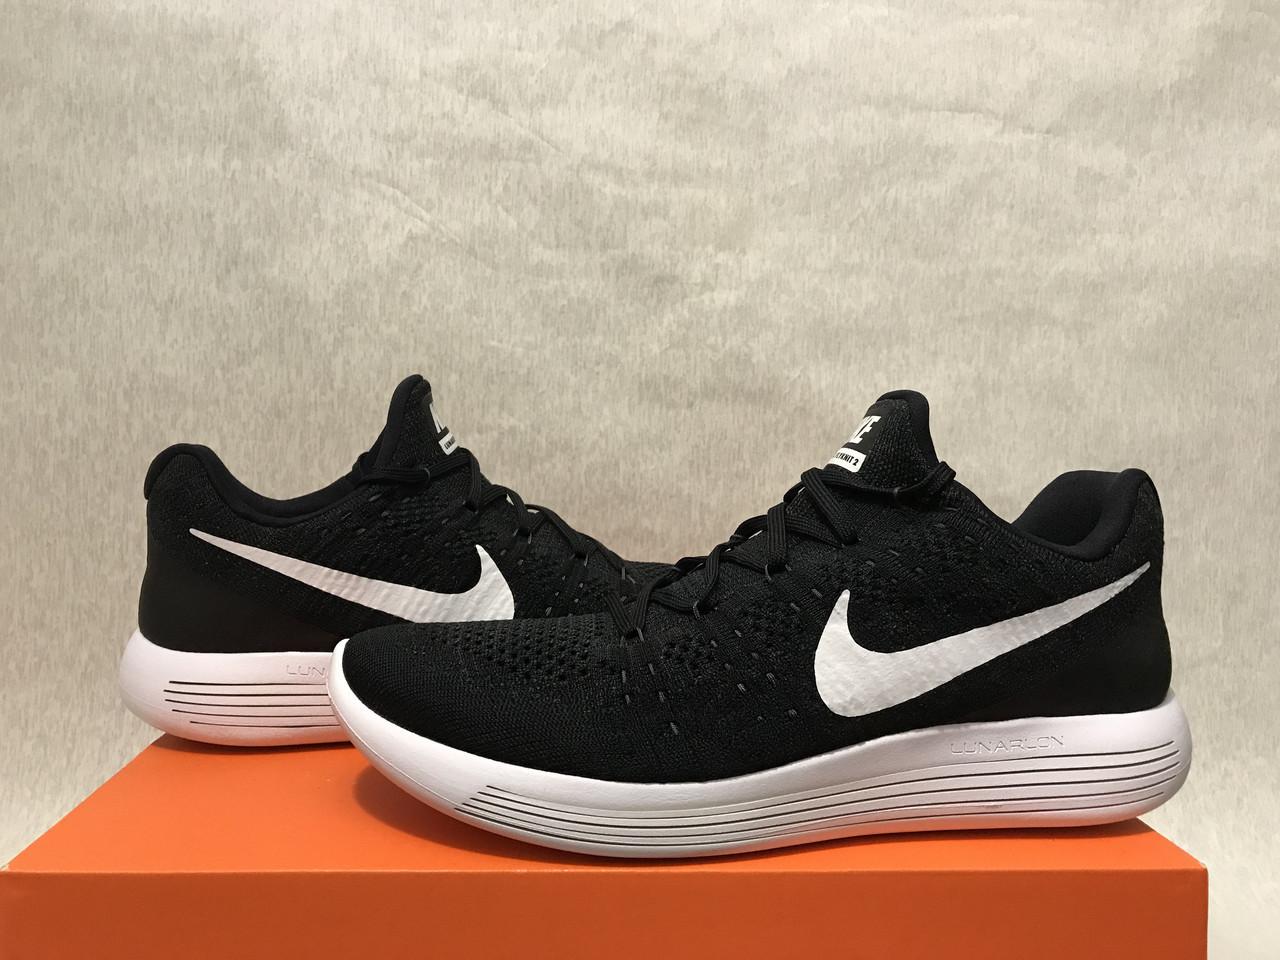 sports shoes 2ce59 610a2 Кроссовки беговые Nike Lunarepic Low Flyknit 2 Оригинал 863779-001 - 42.5 /  US 9.5 (стелька 27.5 см)